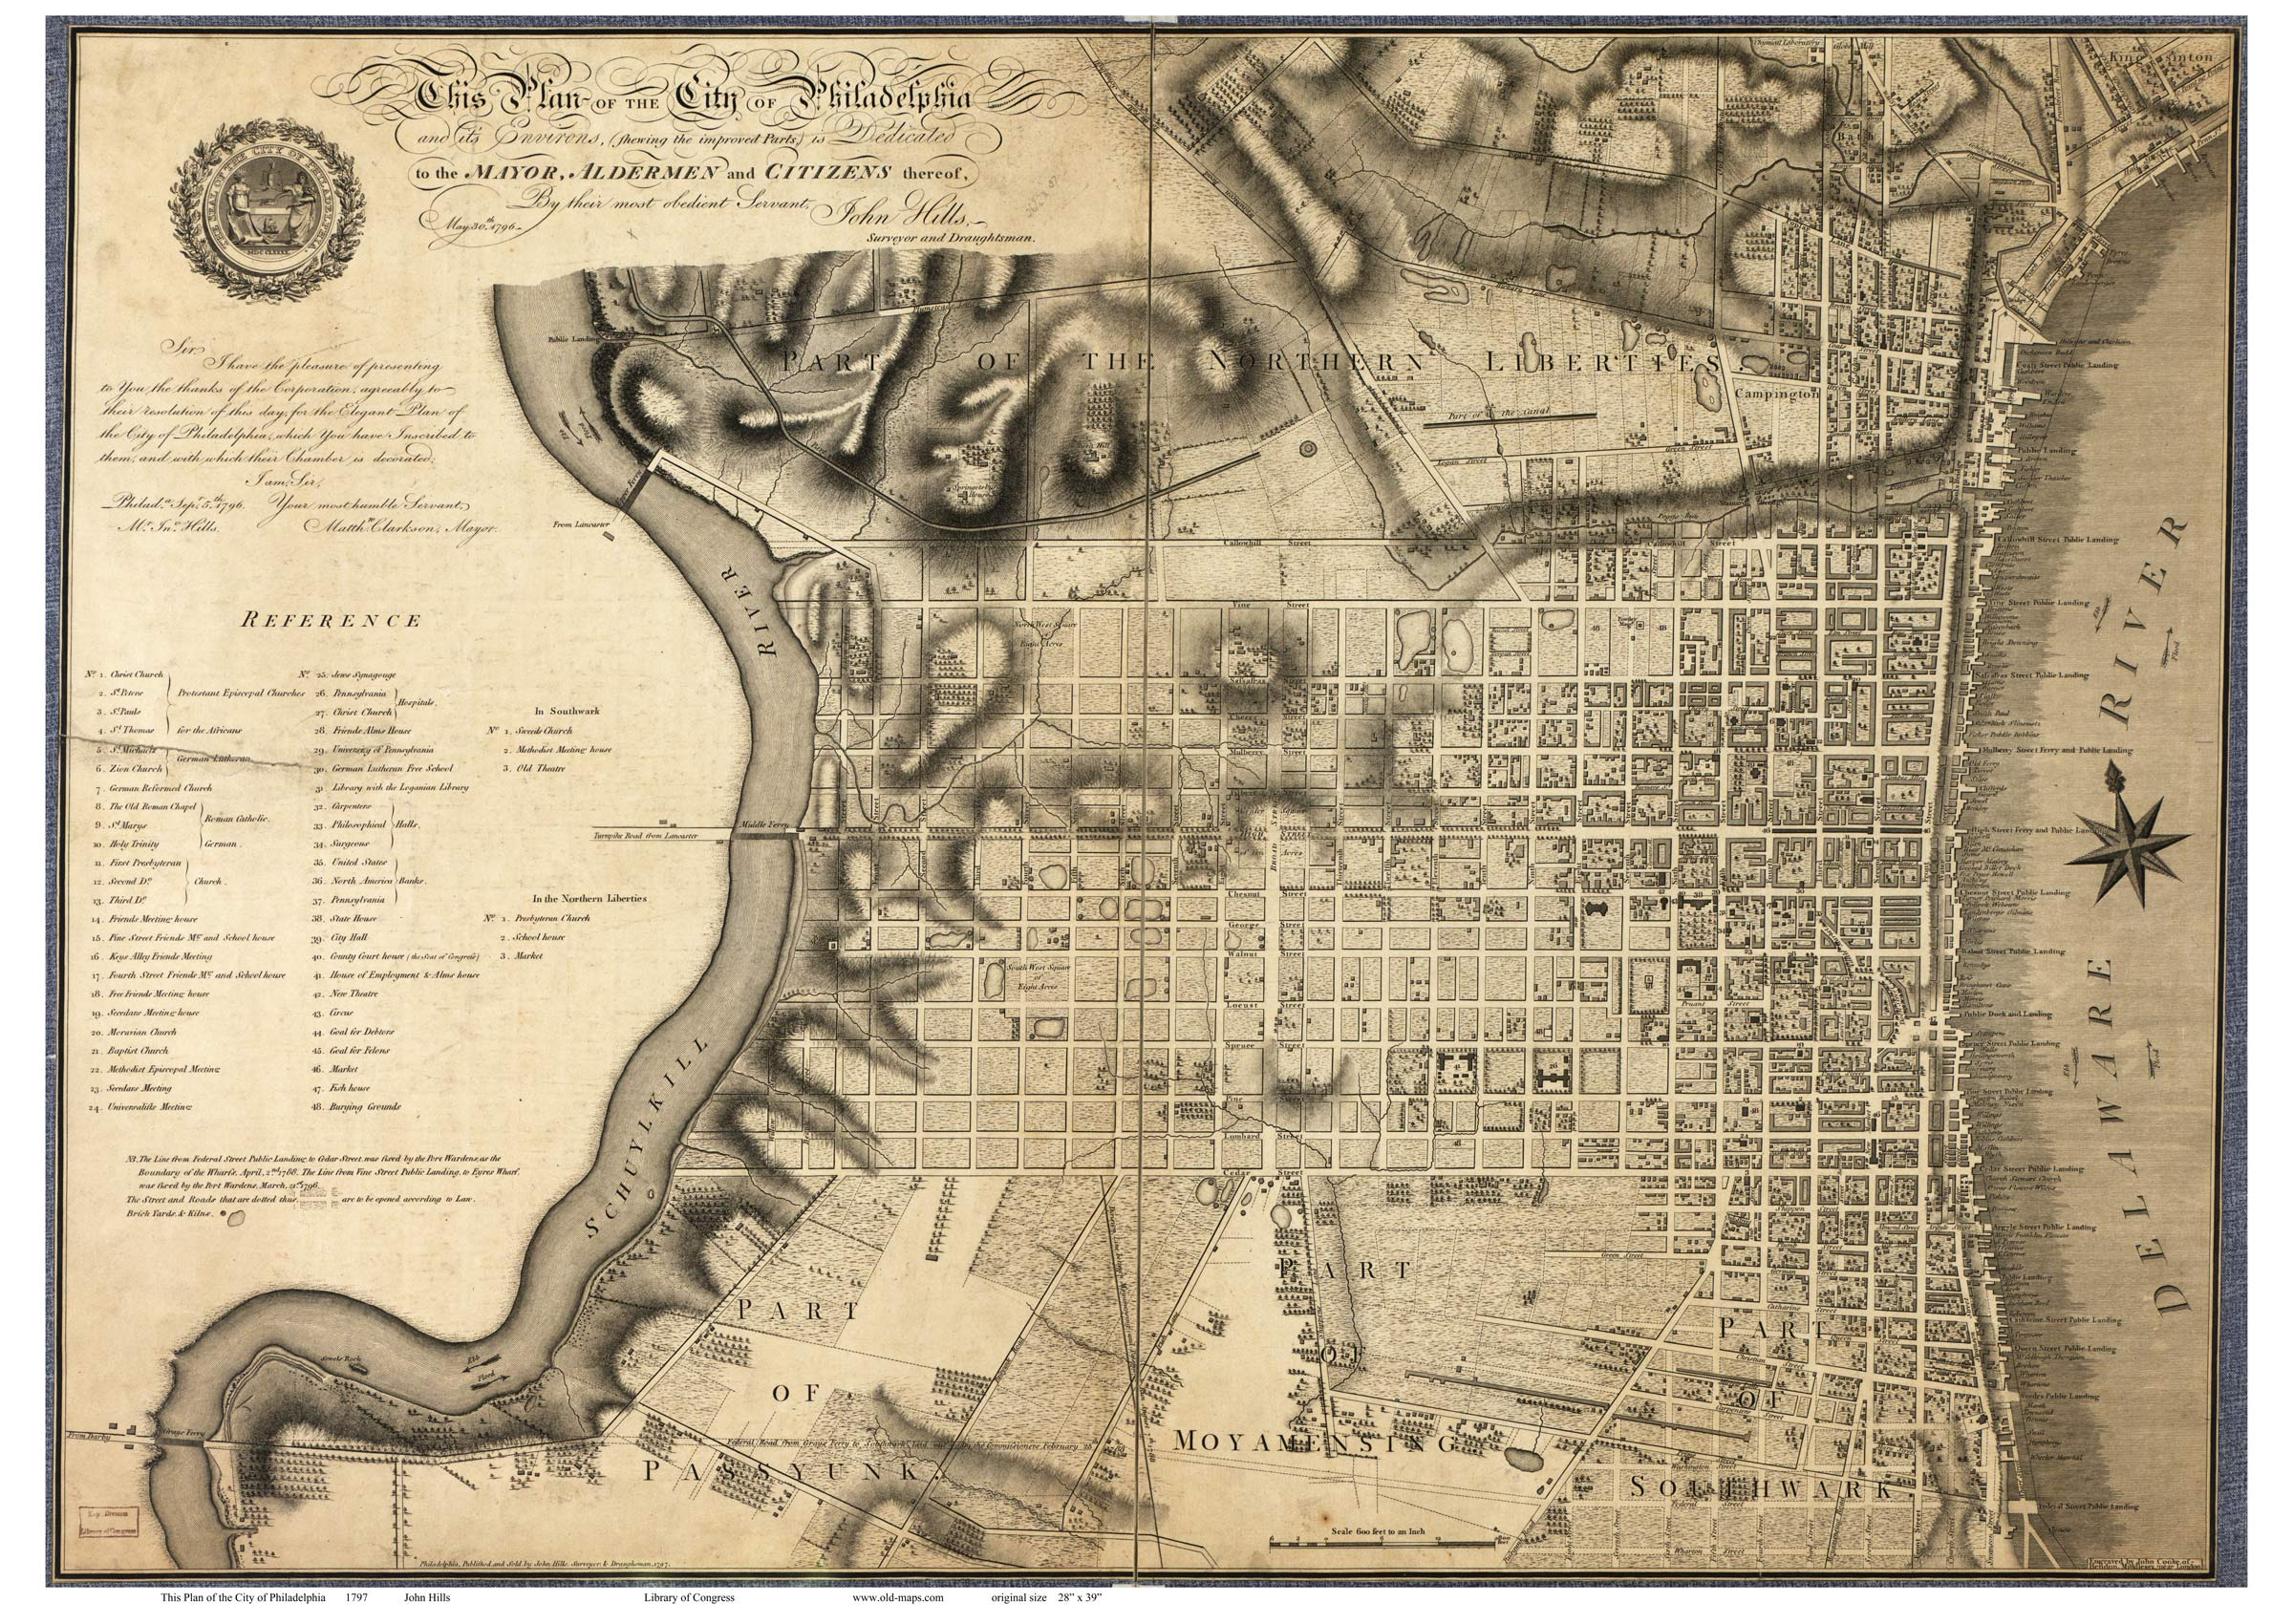 Old Maps of Philadelphia, PA